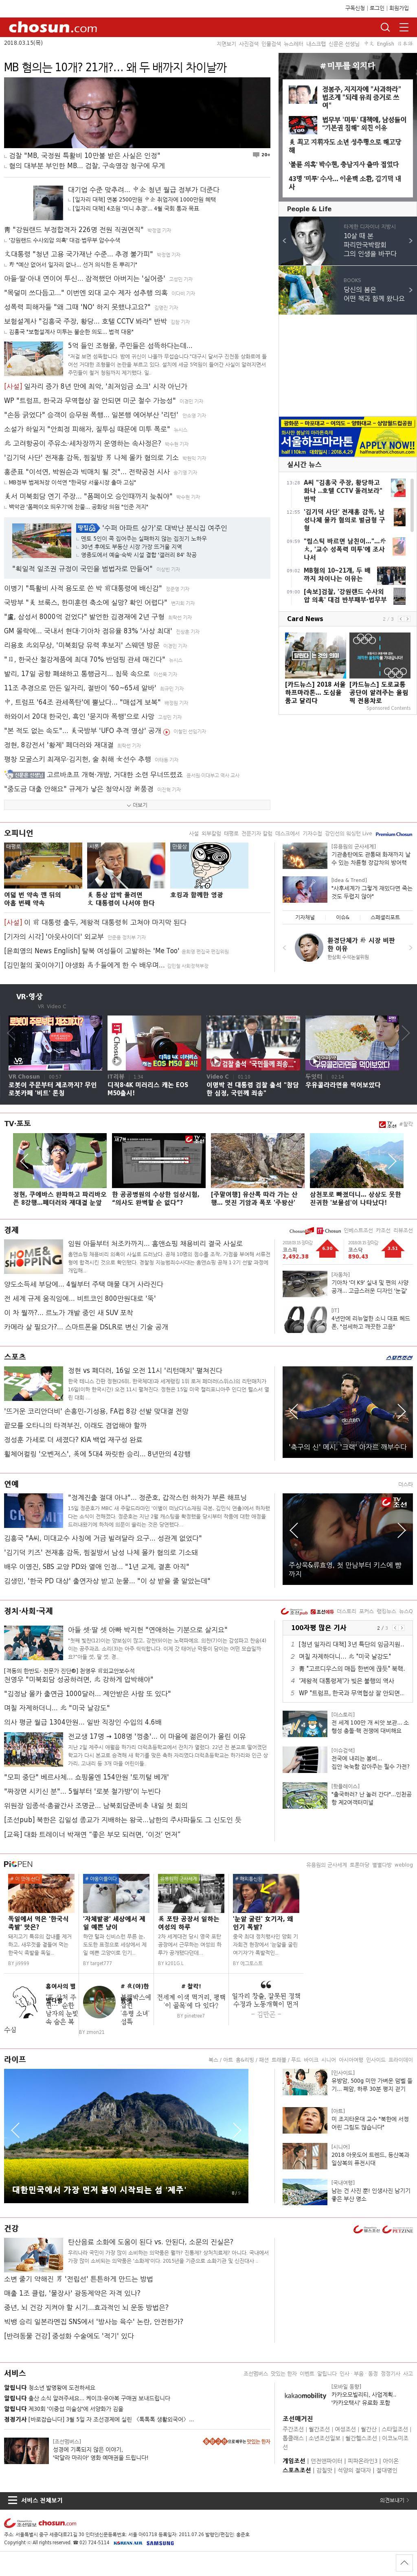 chosun.com at Thursday March 15, 2018, 2:02 p.m. UTC